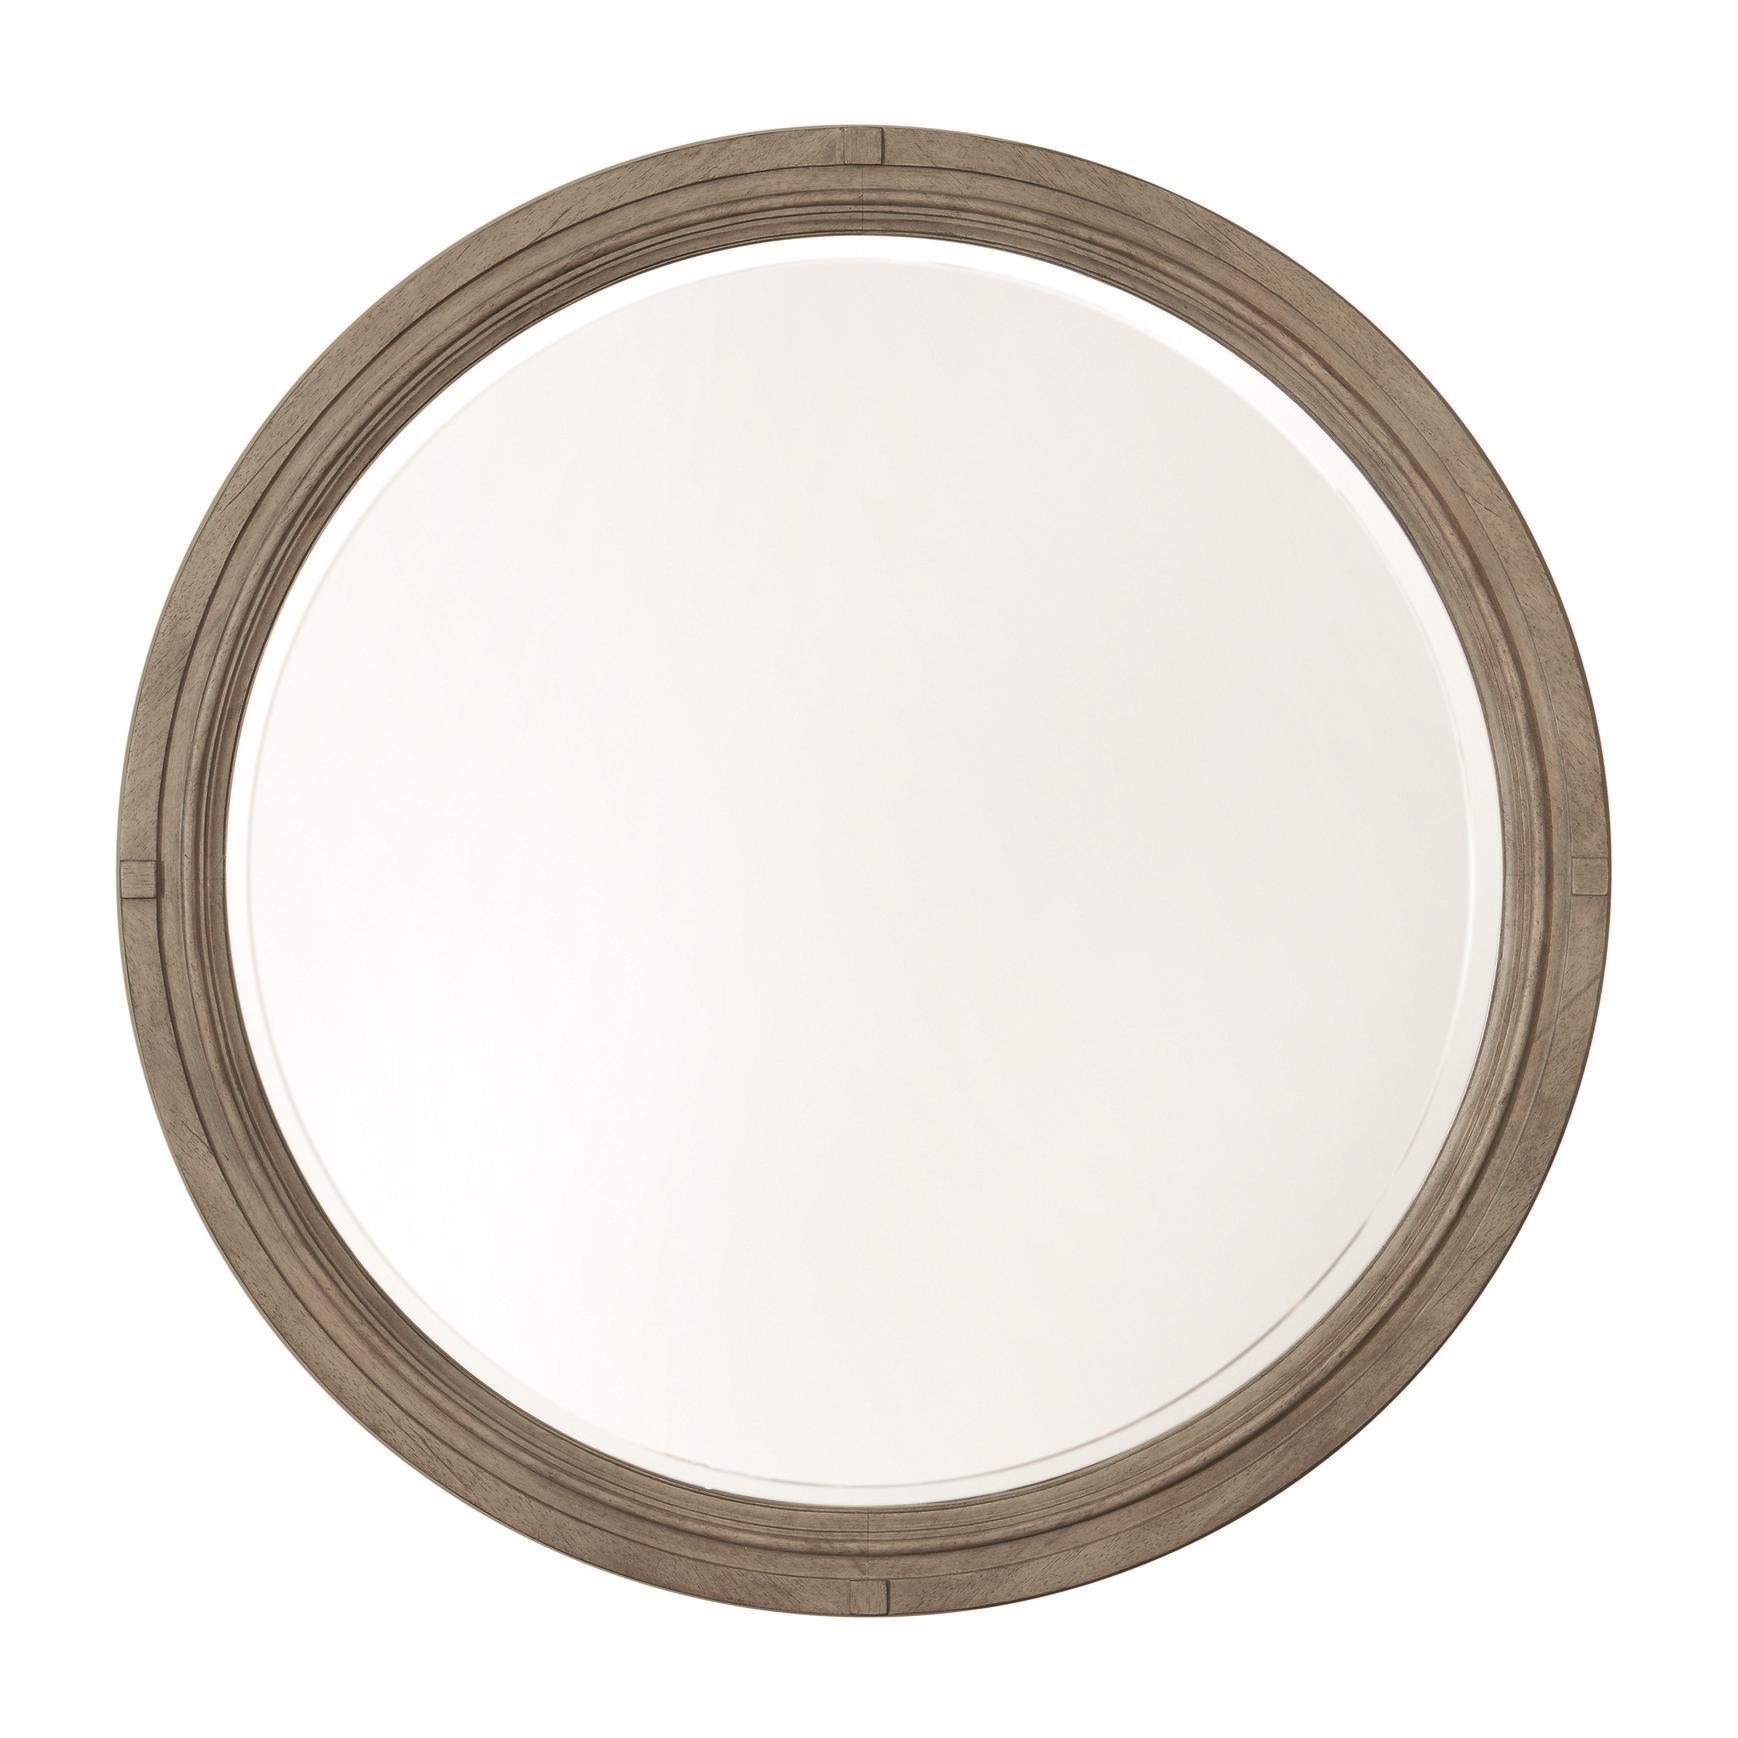 Bassett Bella Round Mirror - Item Number: 2572-0209